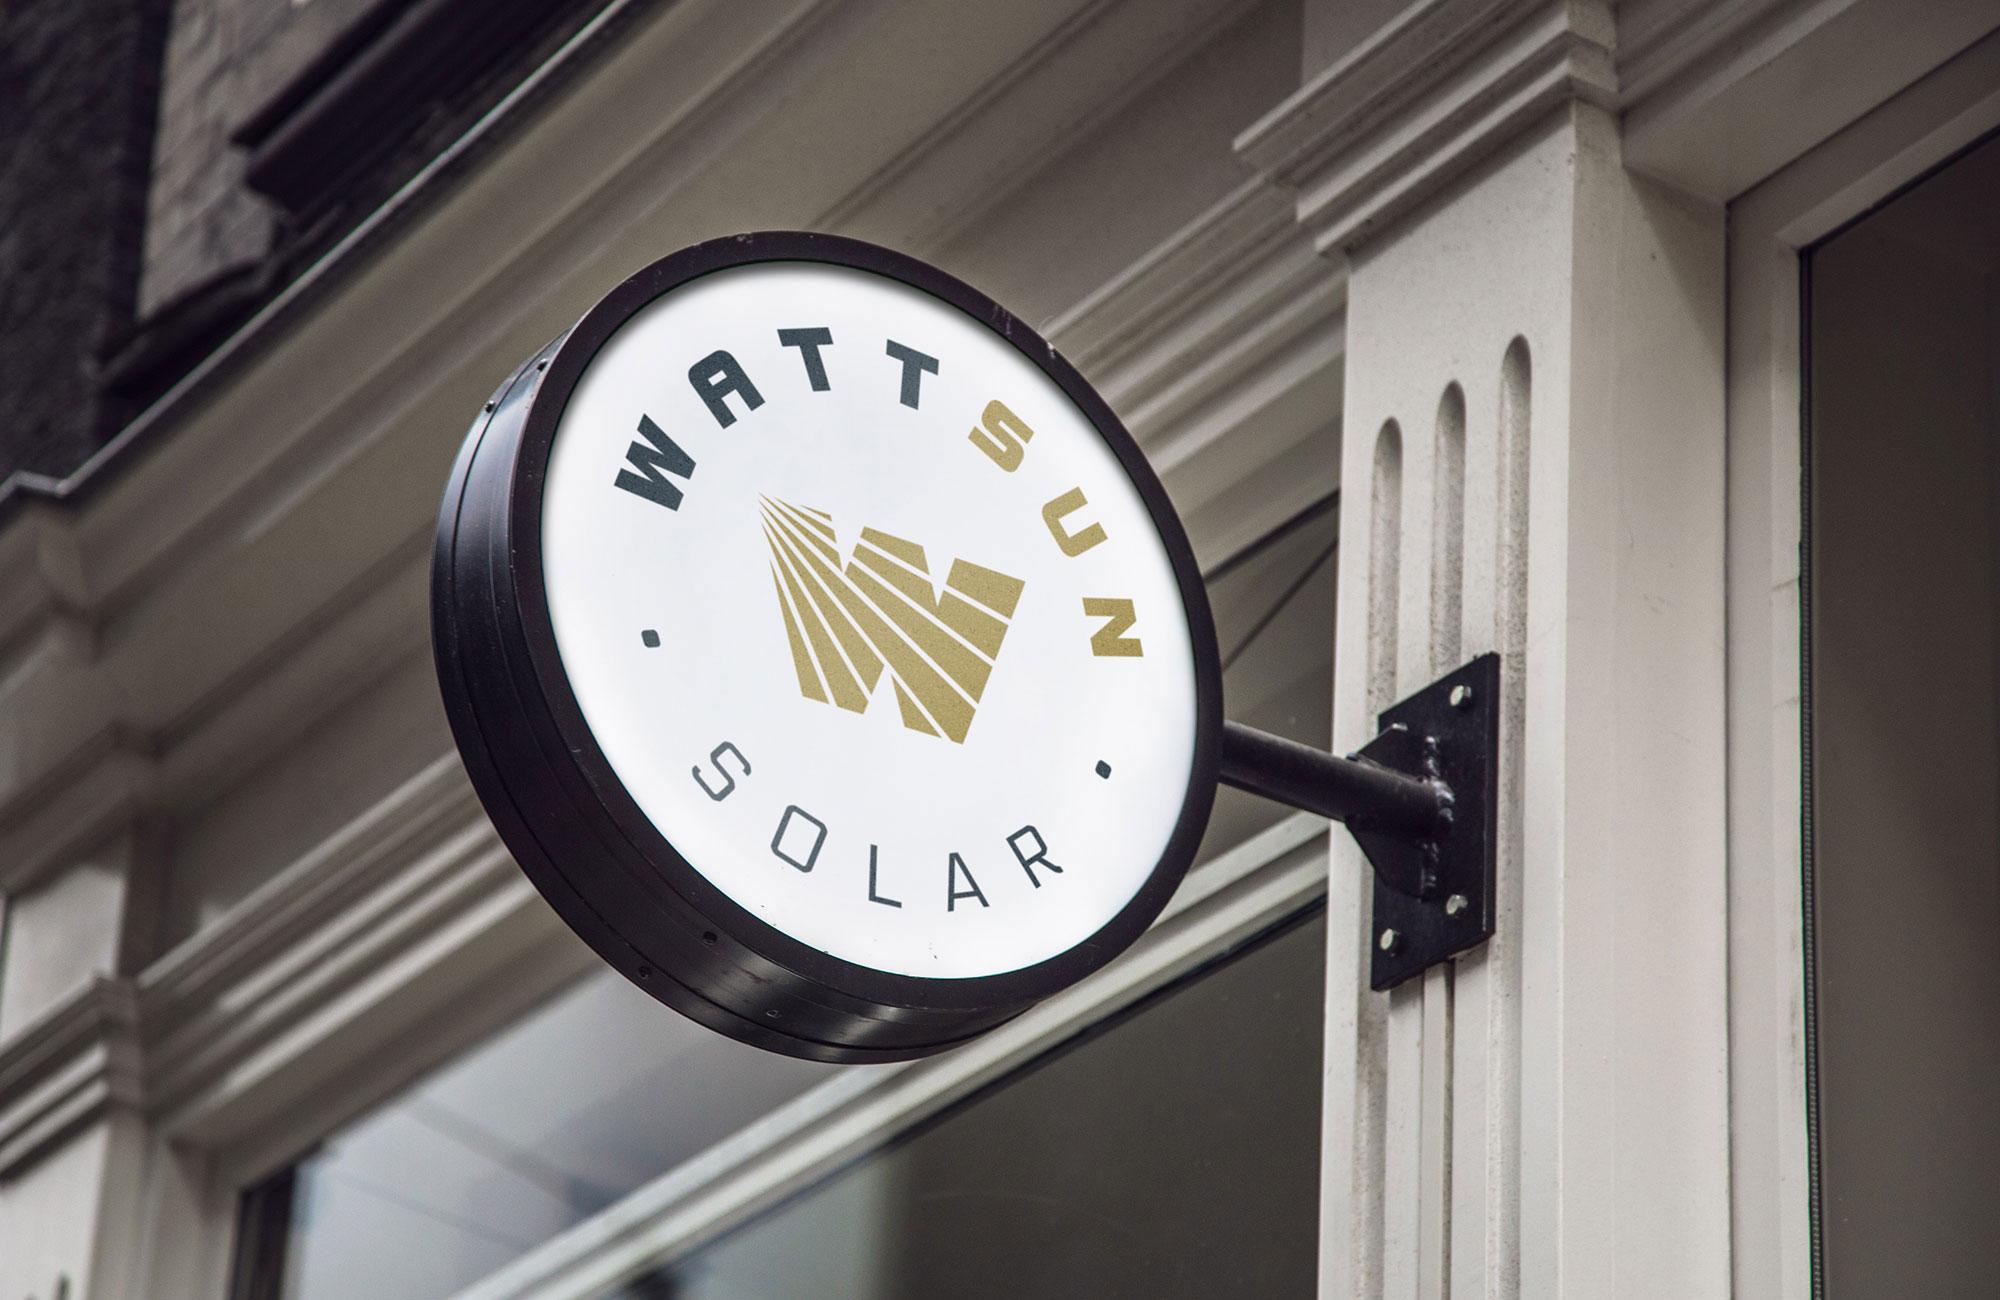 WattSun Brand sign design